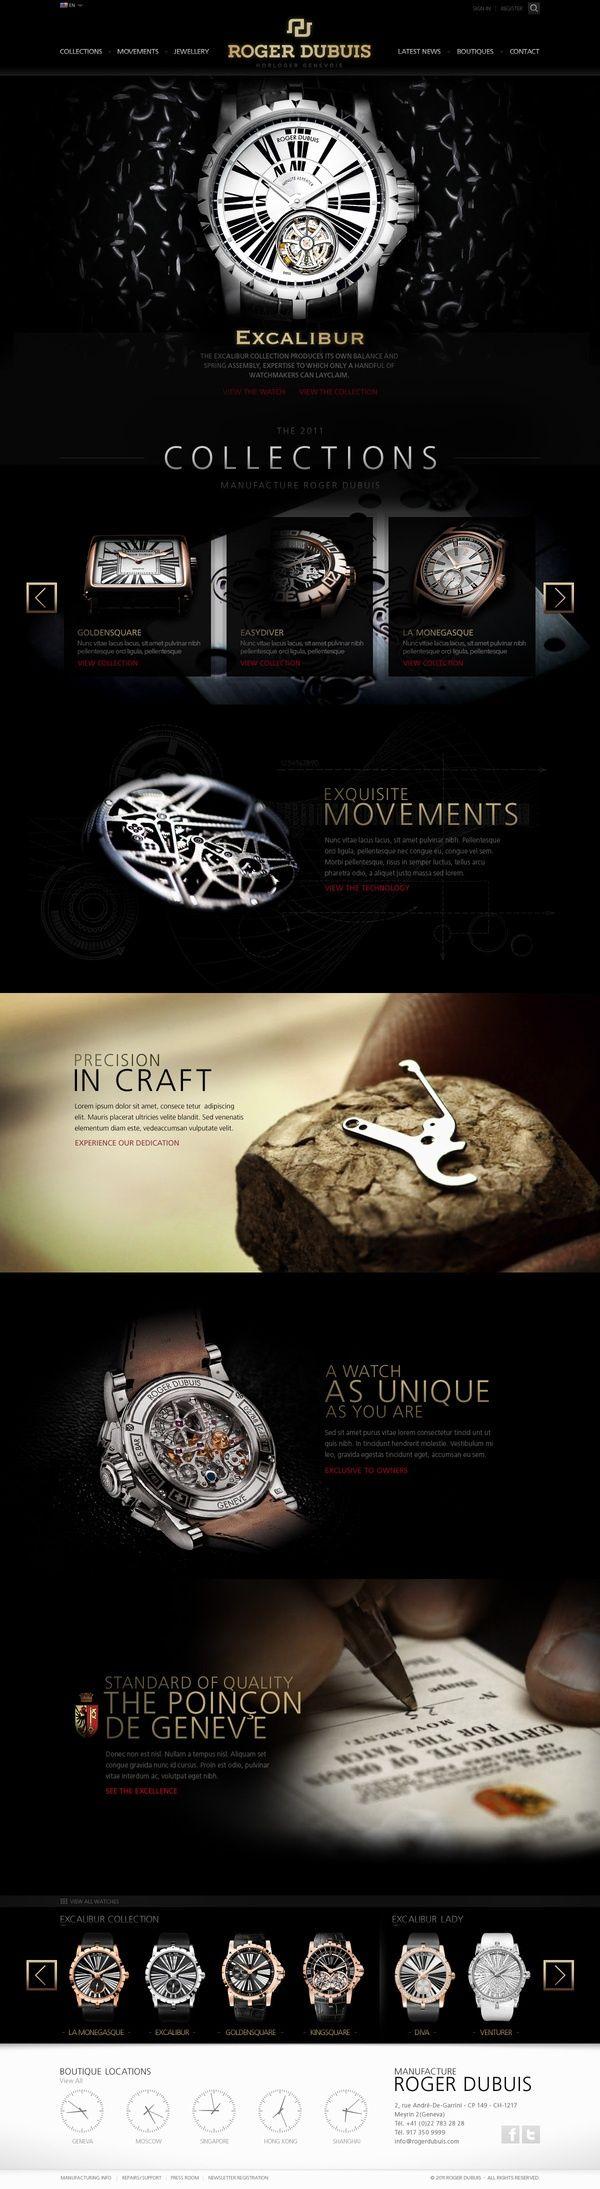 Ideas & Inspirations für Web Designs Roger Dubuis - Site Pitch Redesign by Abe Levin, via Behance Schweizer Webdesign http://www.swisswebwork.ch